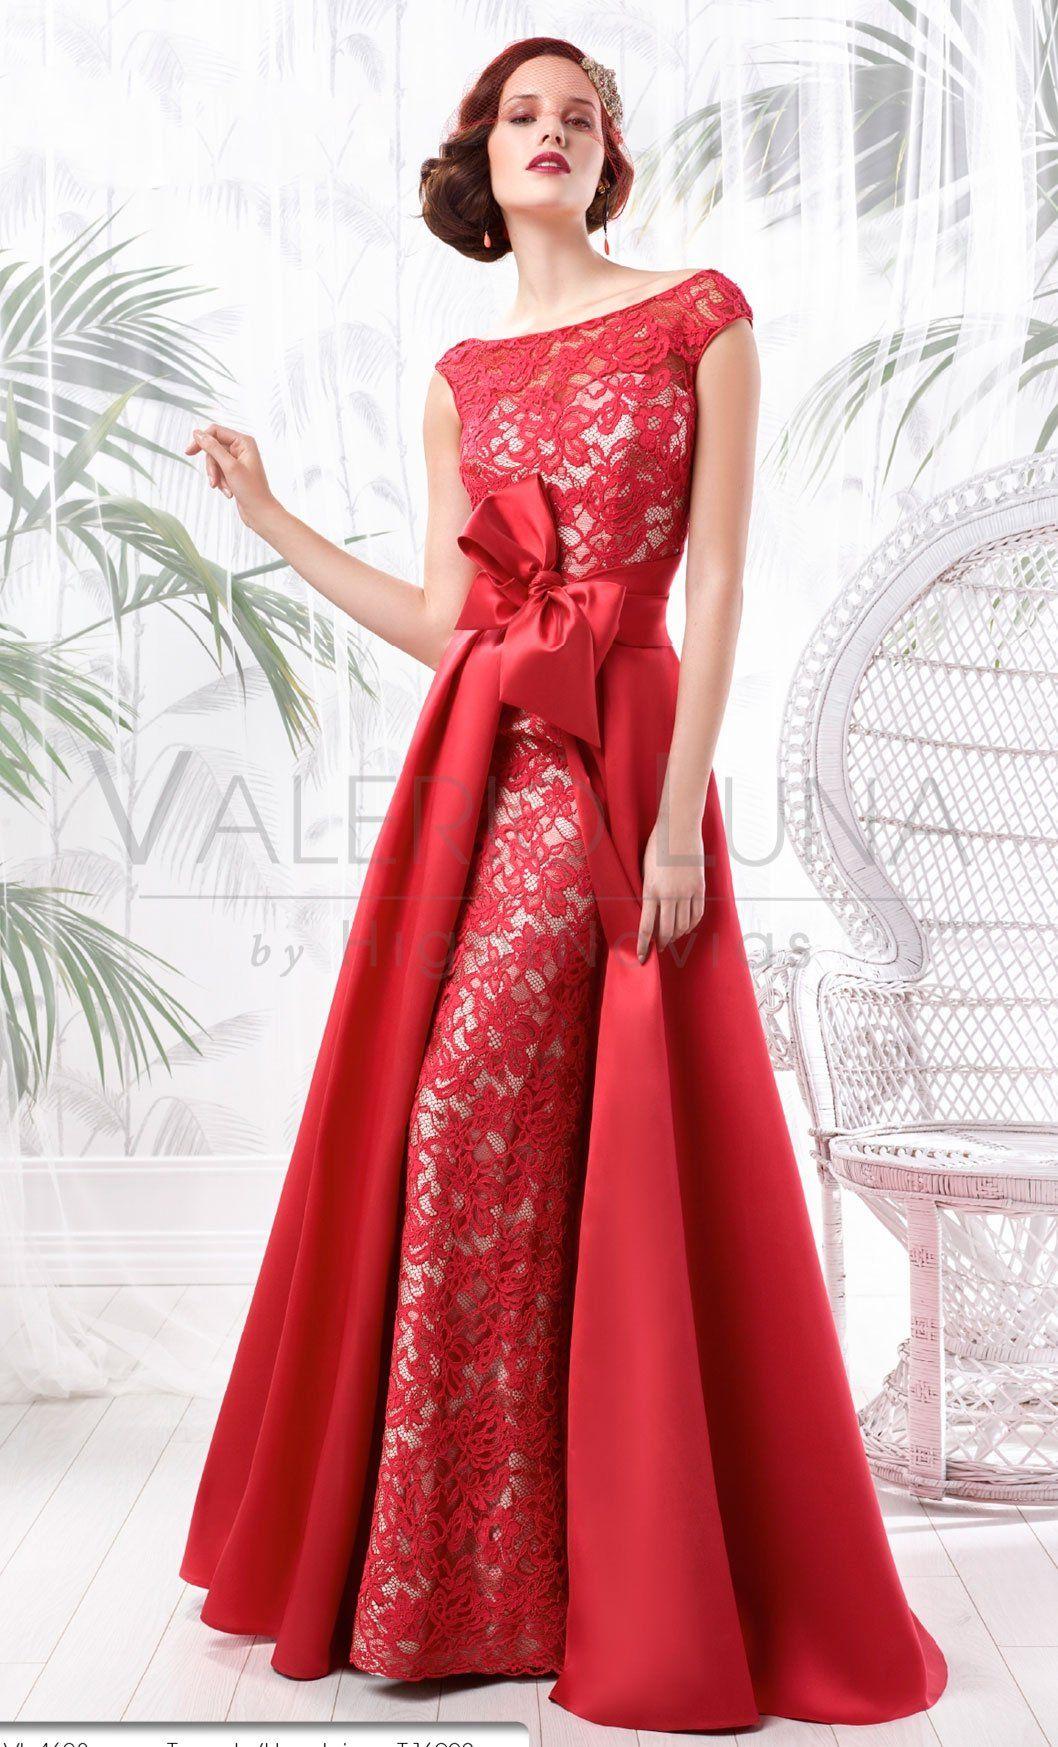 Batik dress for wedding party  Espectacular Valerio Luna  dresss  Pinterest  Gowns Batik muslim